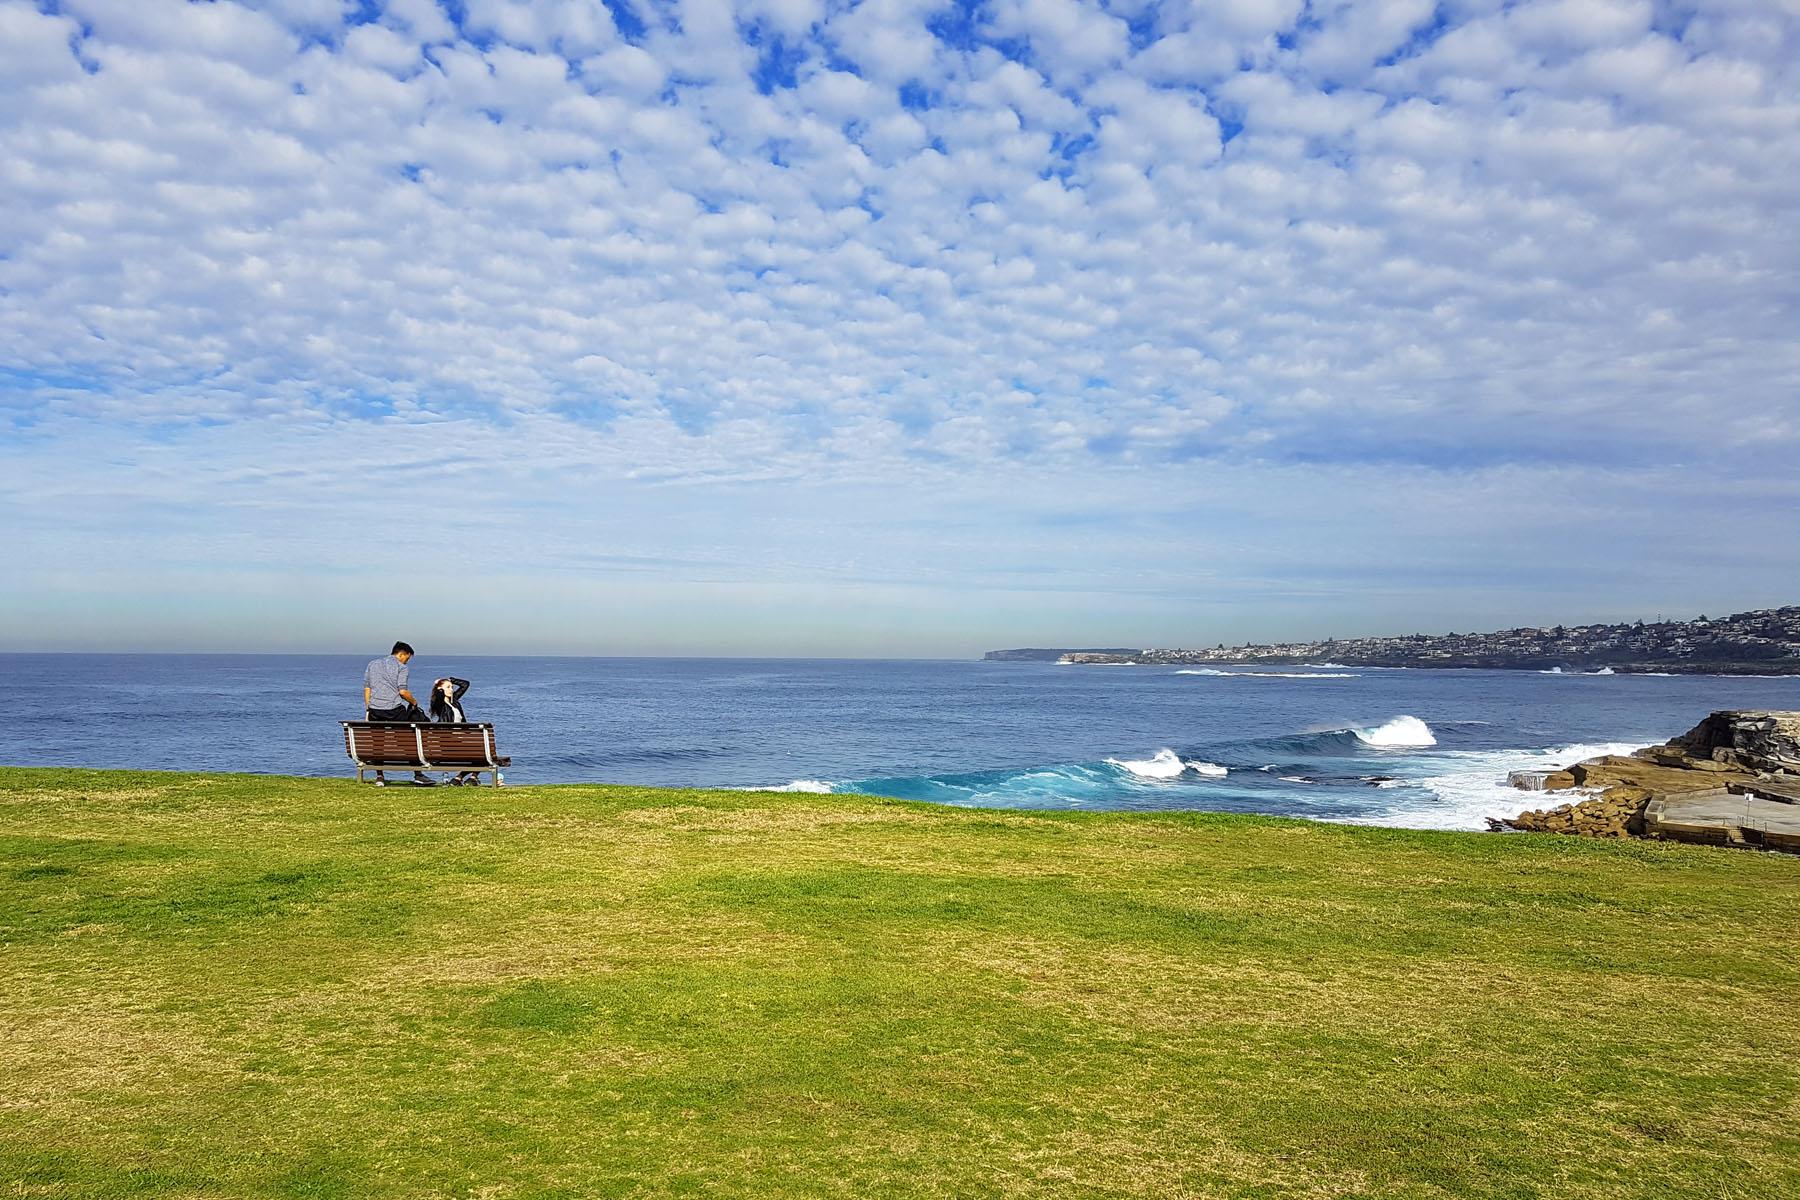 SGMT Australia Sydney_Bondi to Coogee Coastal Walk_17 Clifftop Bench Couple Goals